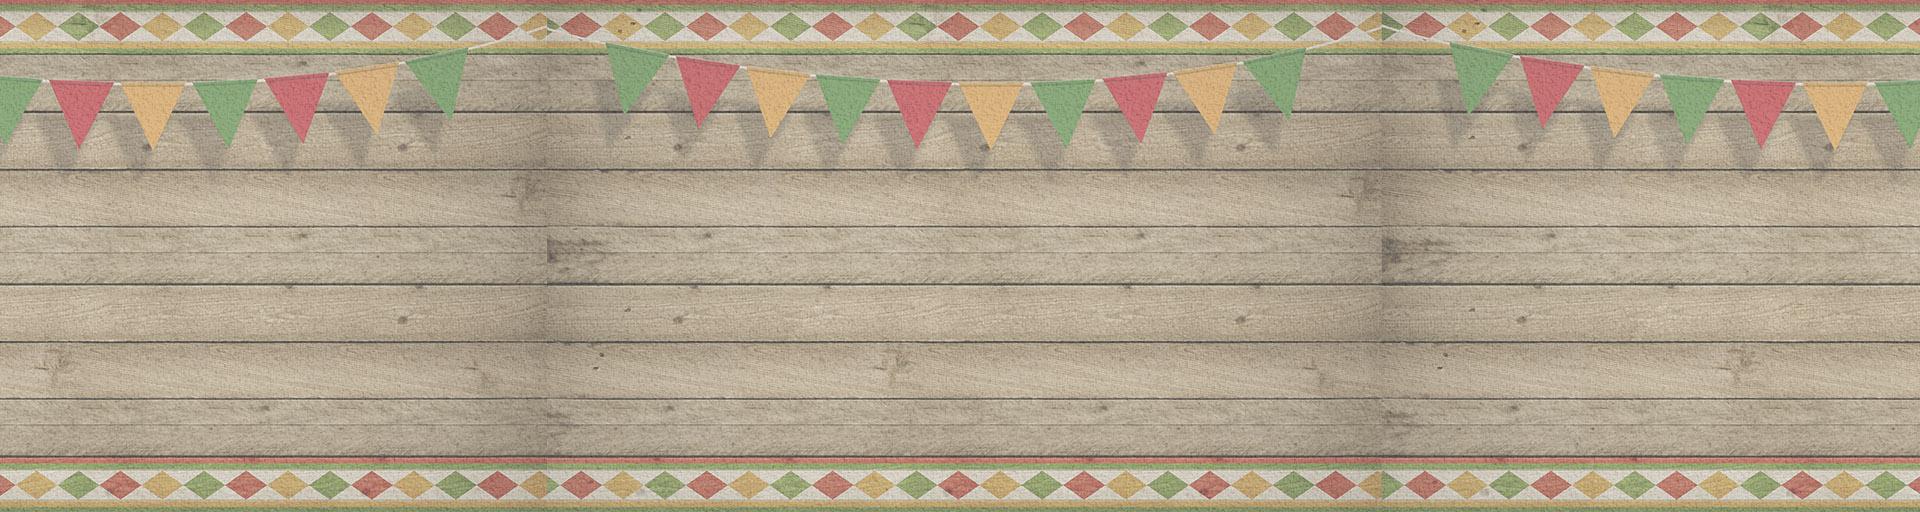 Cinco de Mayo USA Mexican Celebration Backgrounds Wood 1920x512